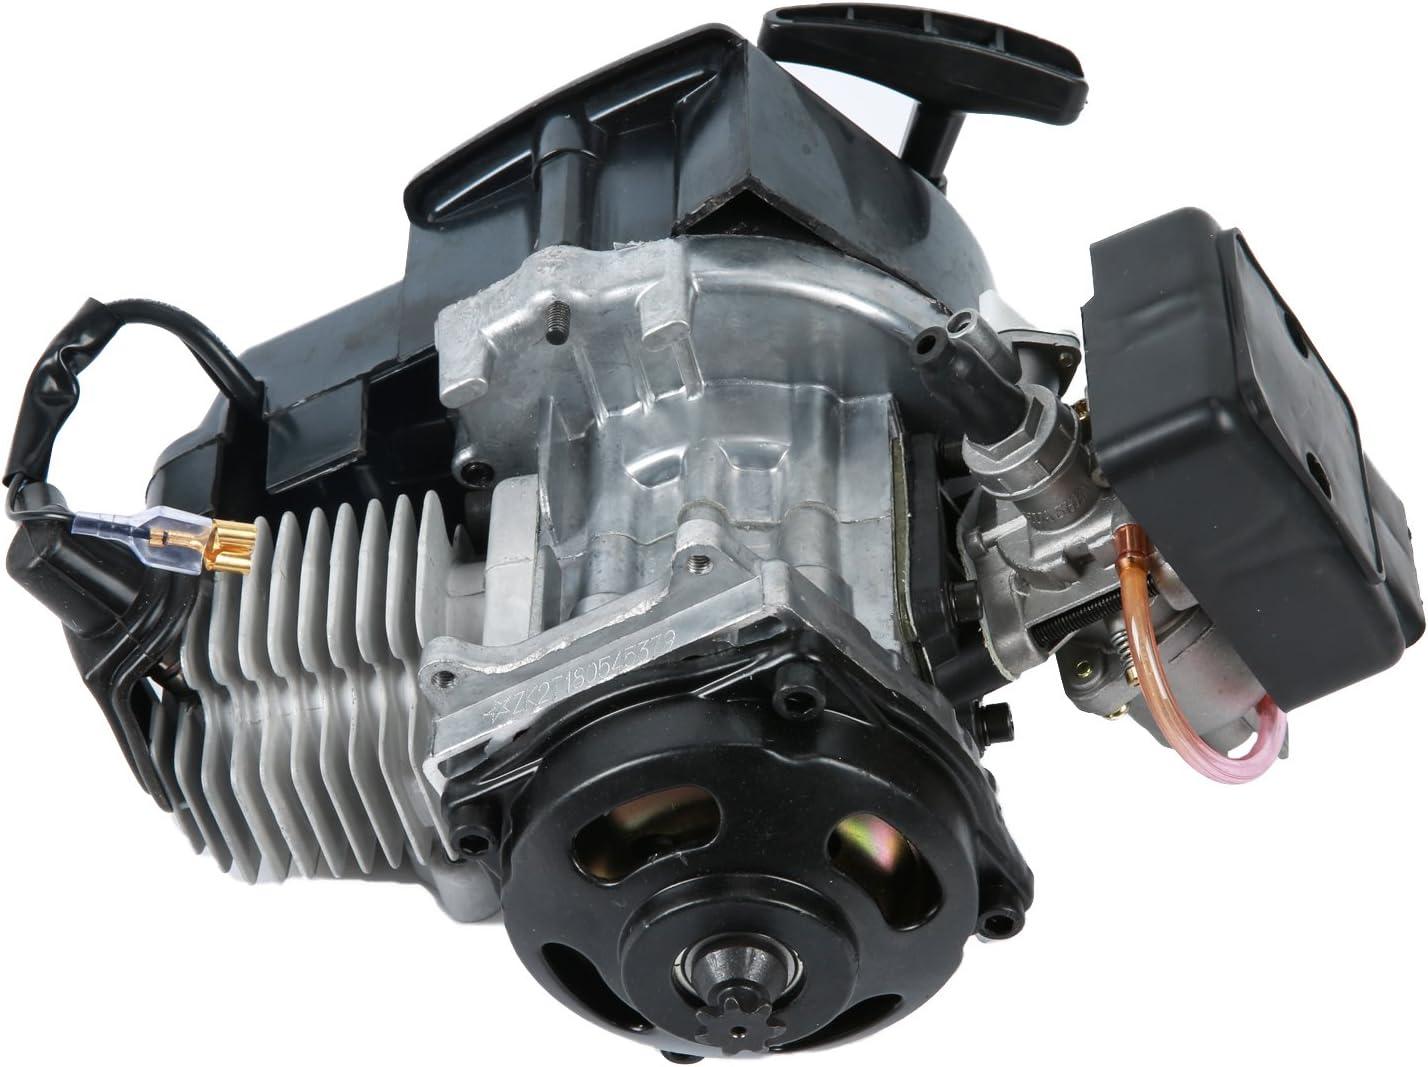 YaeTek 49cc 2-Stroke New Motor Engine Pocket Mini Bike Scooter ATV H EN02